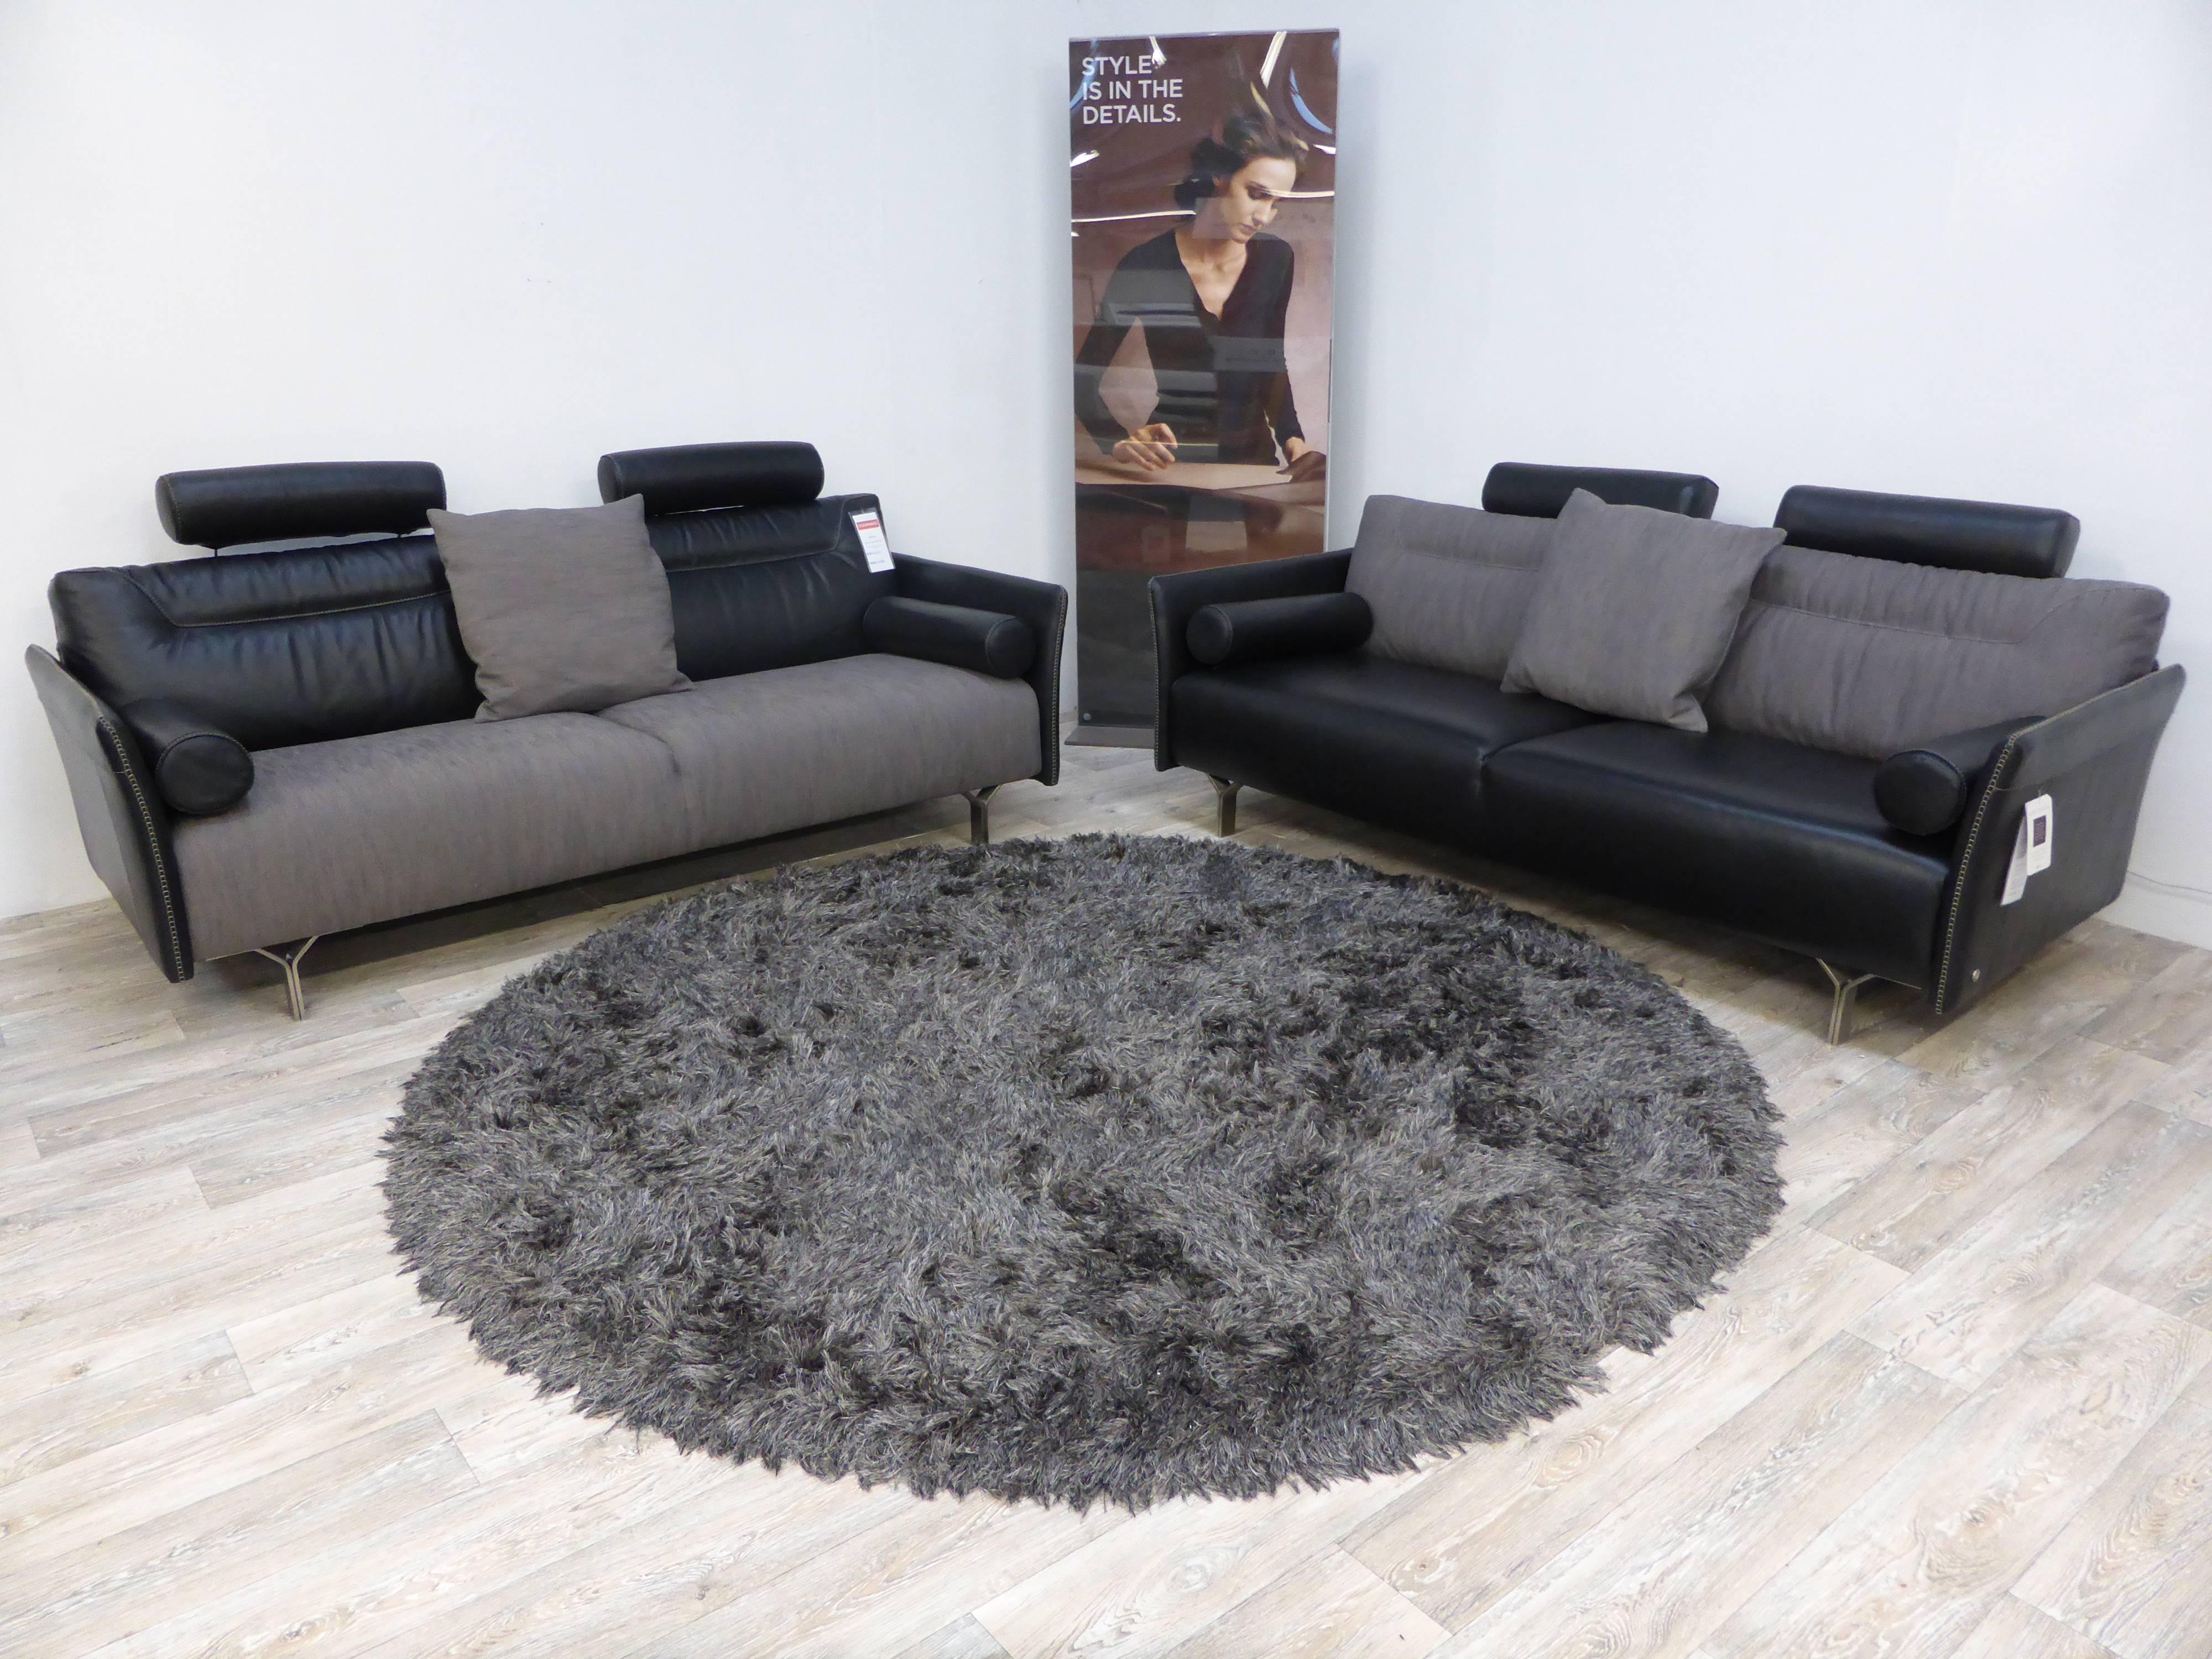 Natuzzi Fabric Sofa - Bible-Saitama with Leather And Material Sofas (Image 20 of 30)